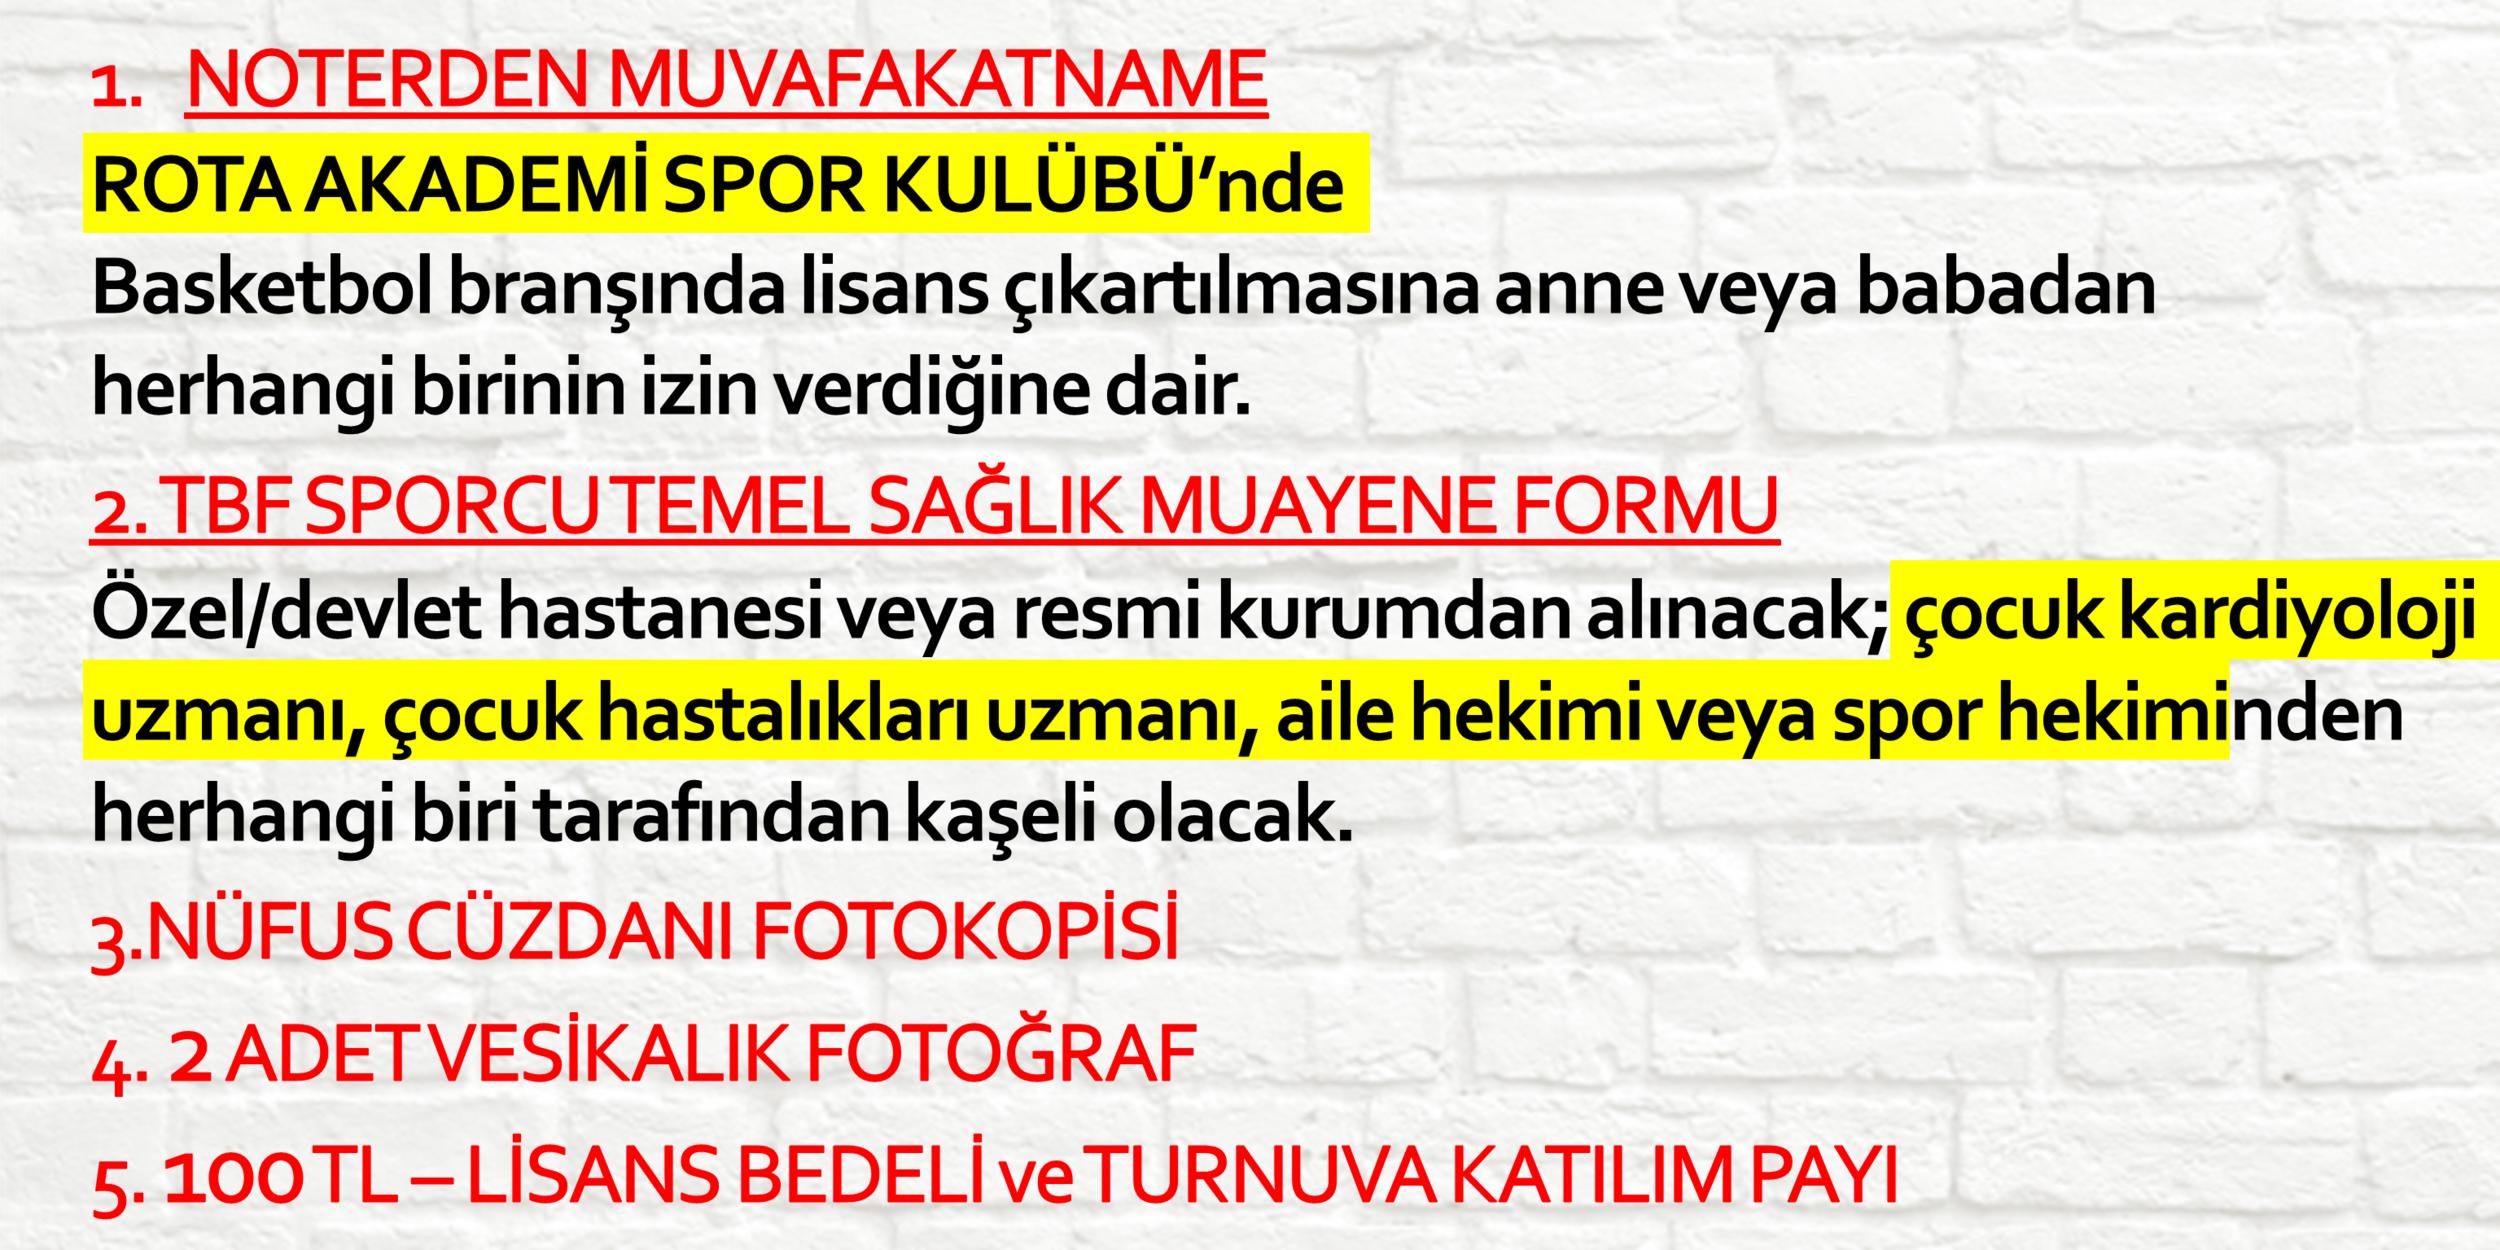 rota-akademi-lisans-evraklari.png